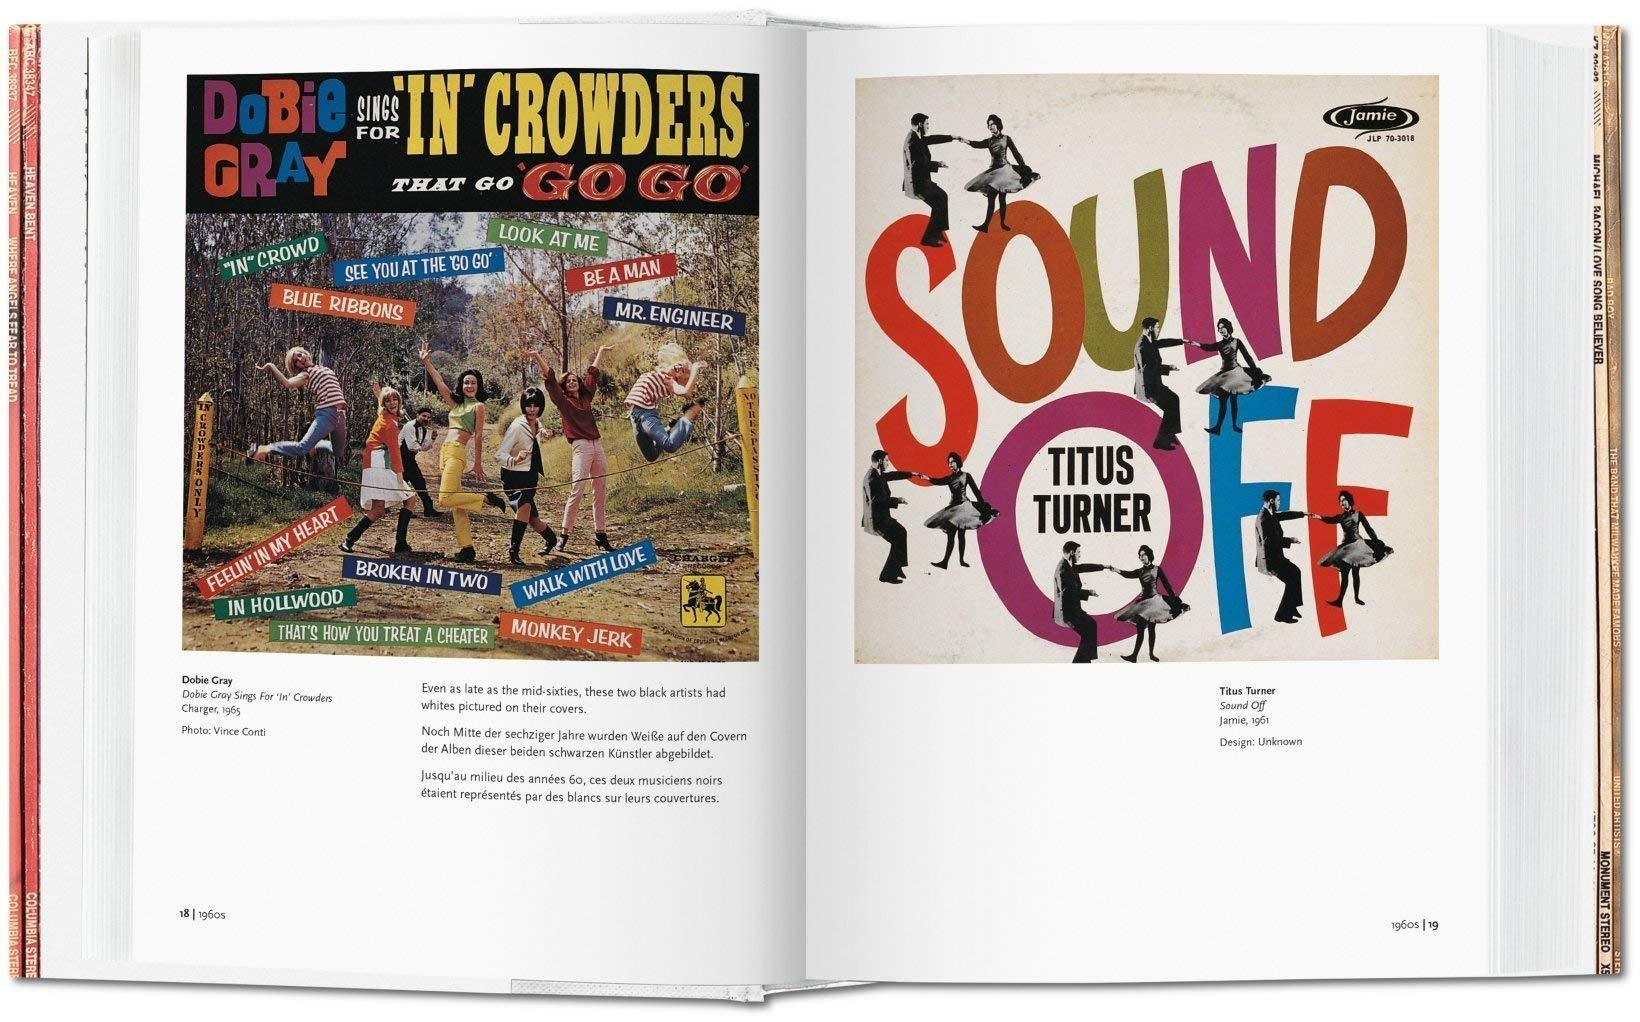 1000 Record Covers: Ochs, Michael: 8601416311692: Books - Amazon.ca